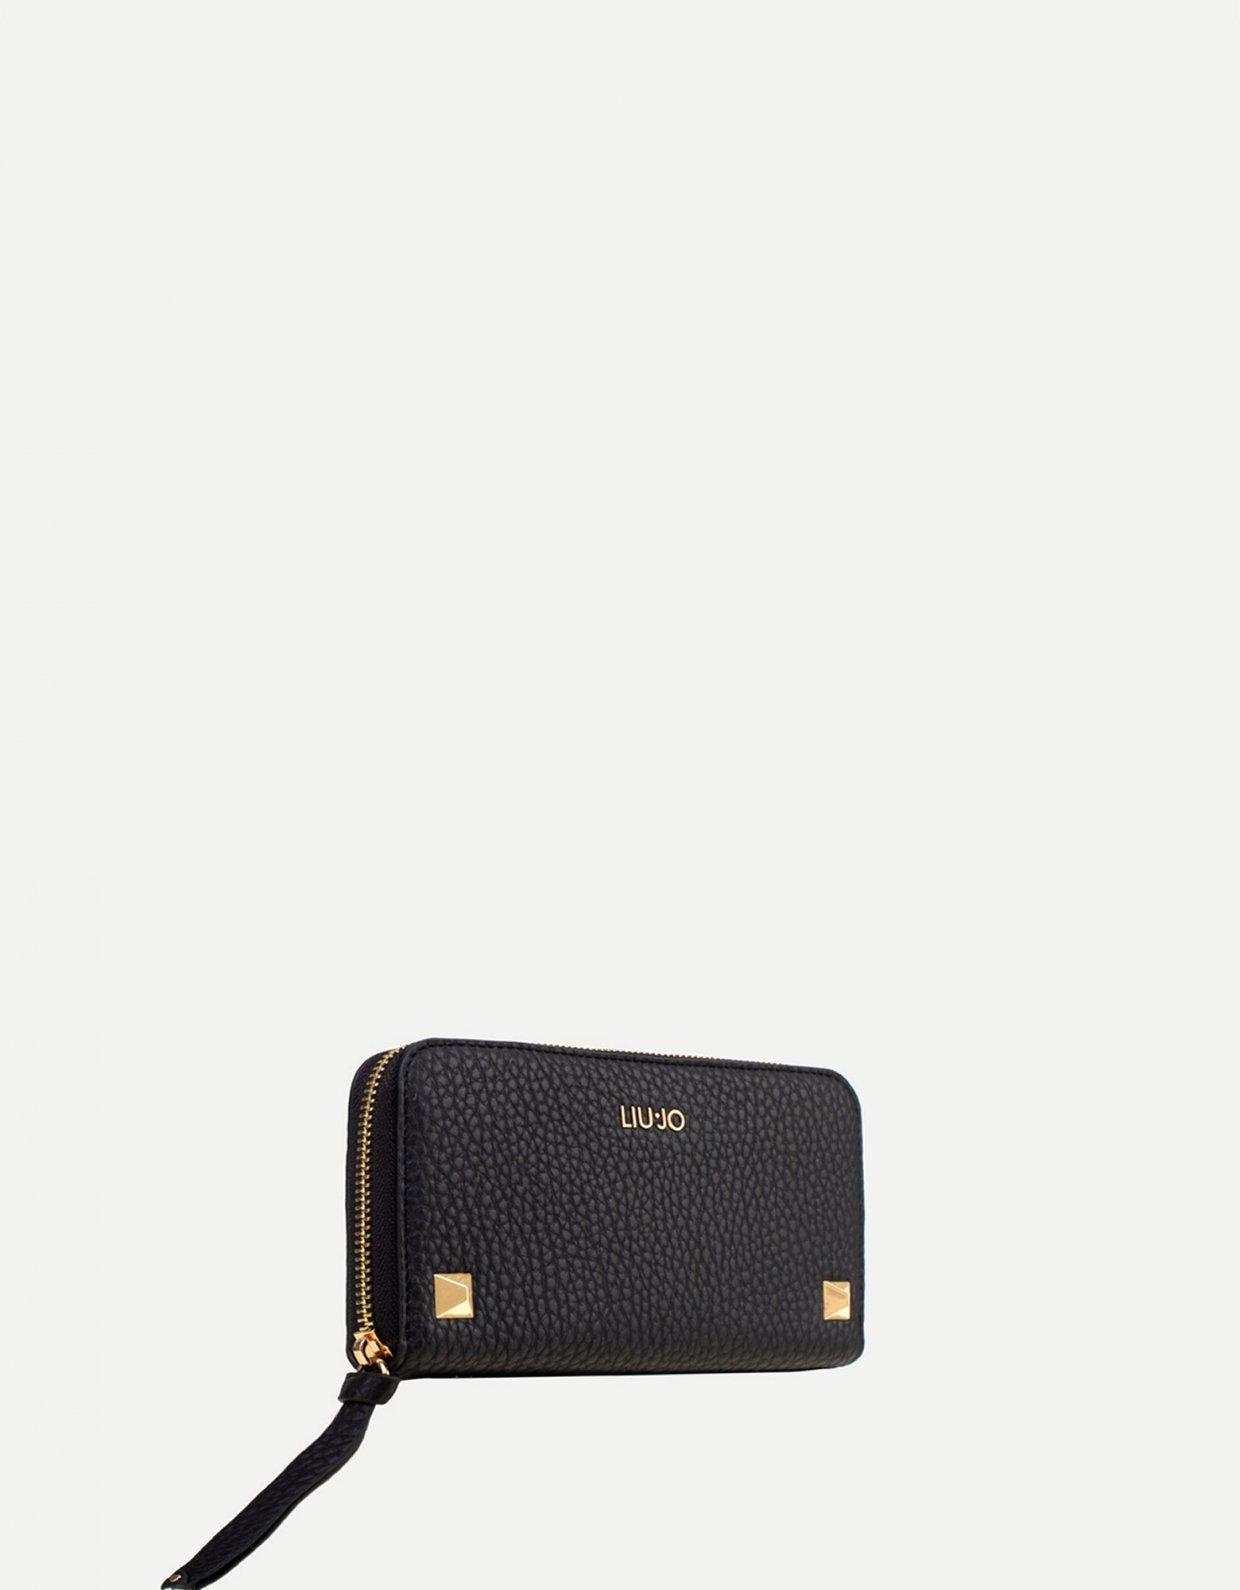 Liu Jo Large wallet with studs black